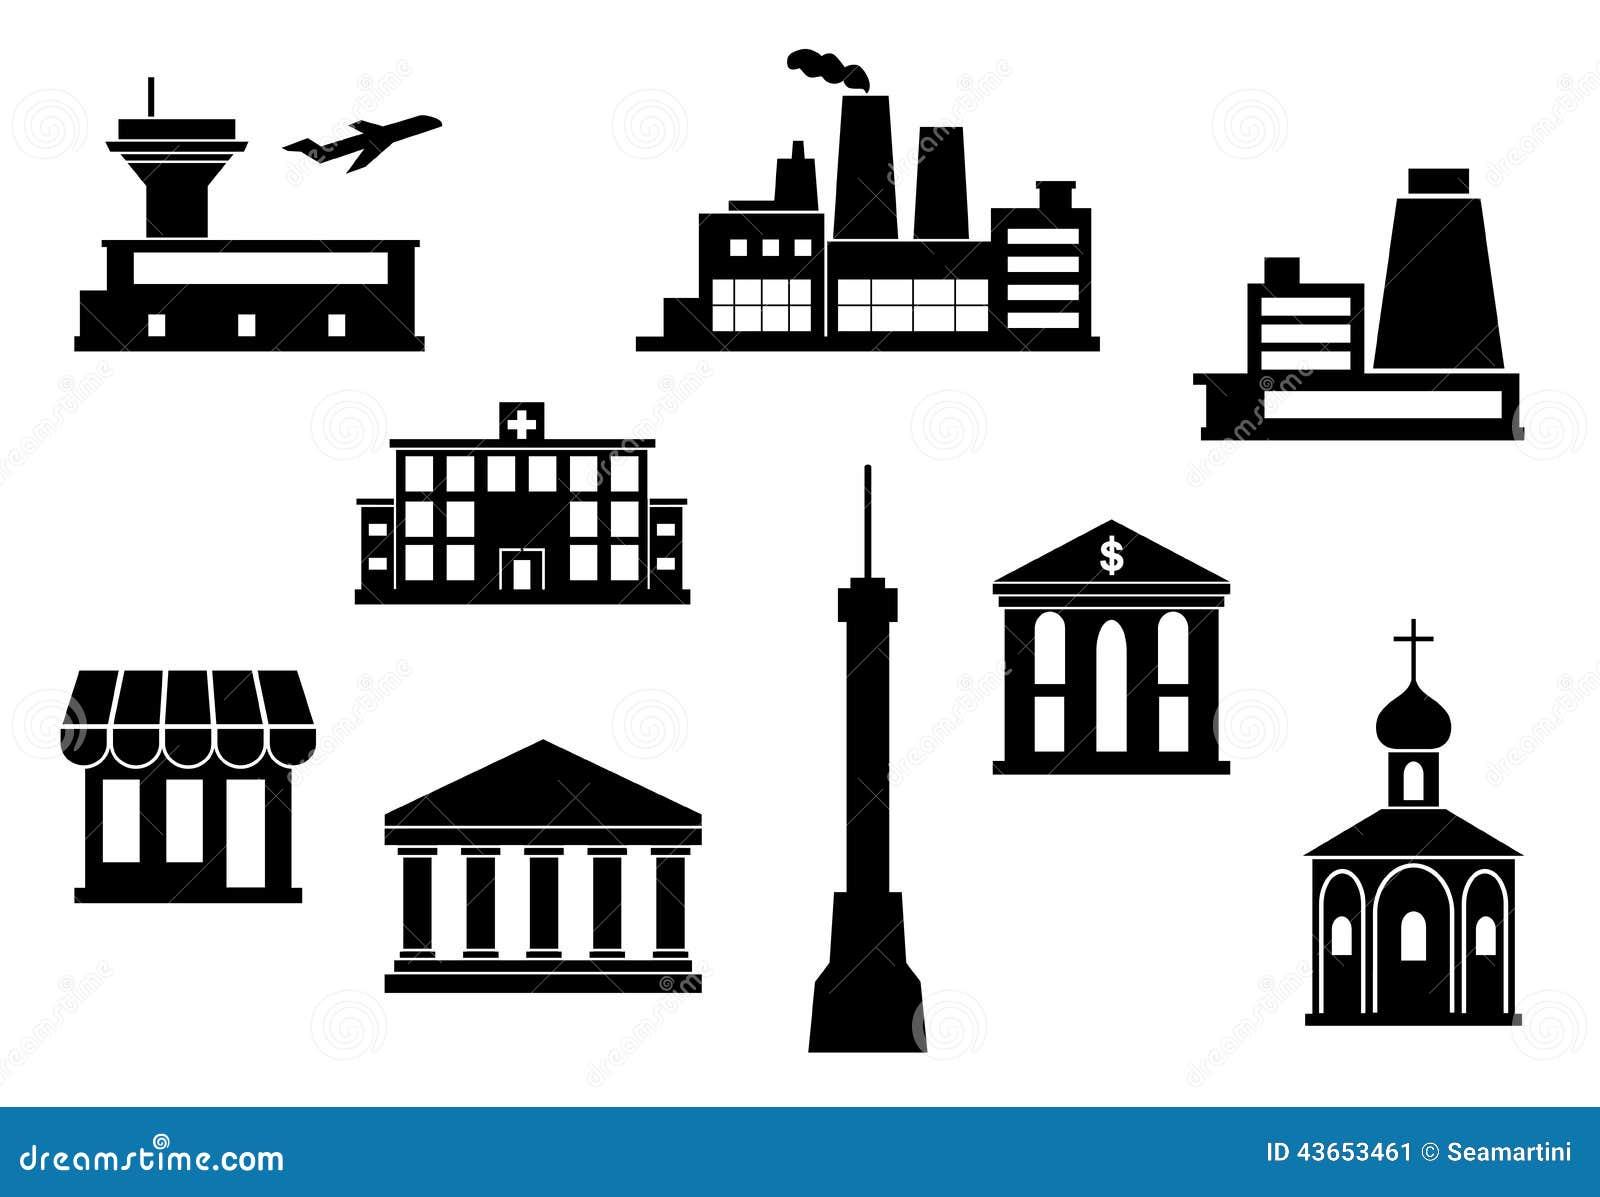 building icons set stock vector image 43653461. Black Bedroom Furniture Sets. Home Design Ideas